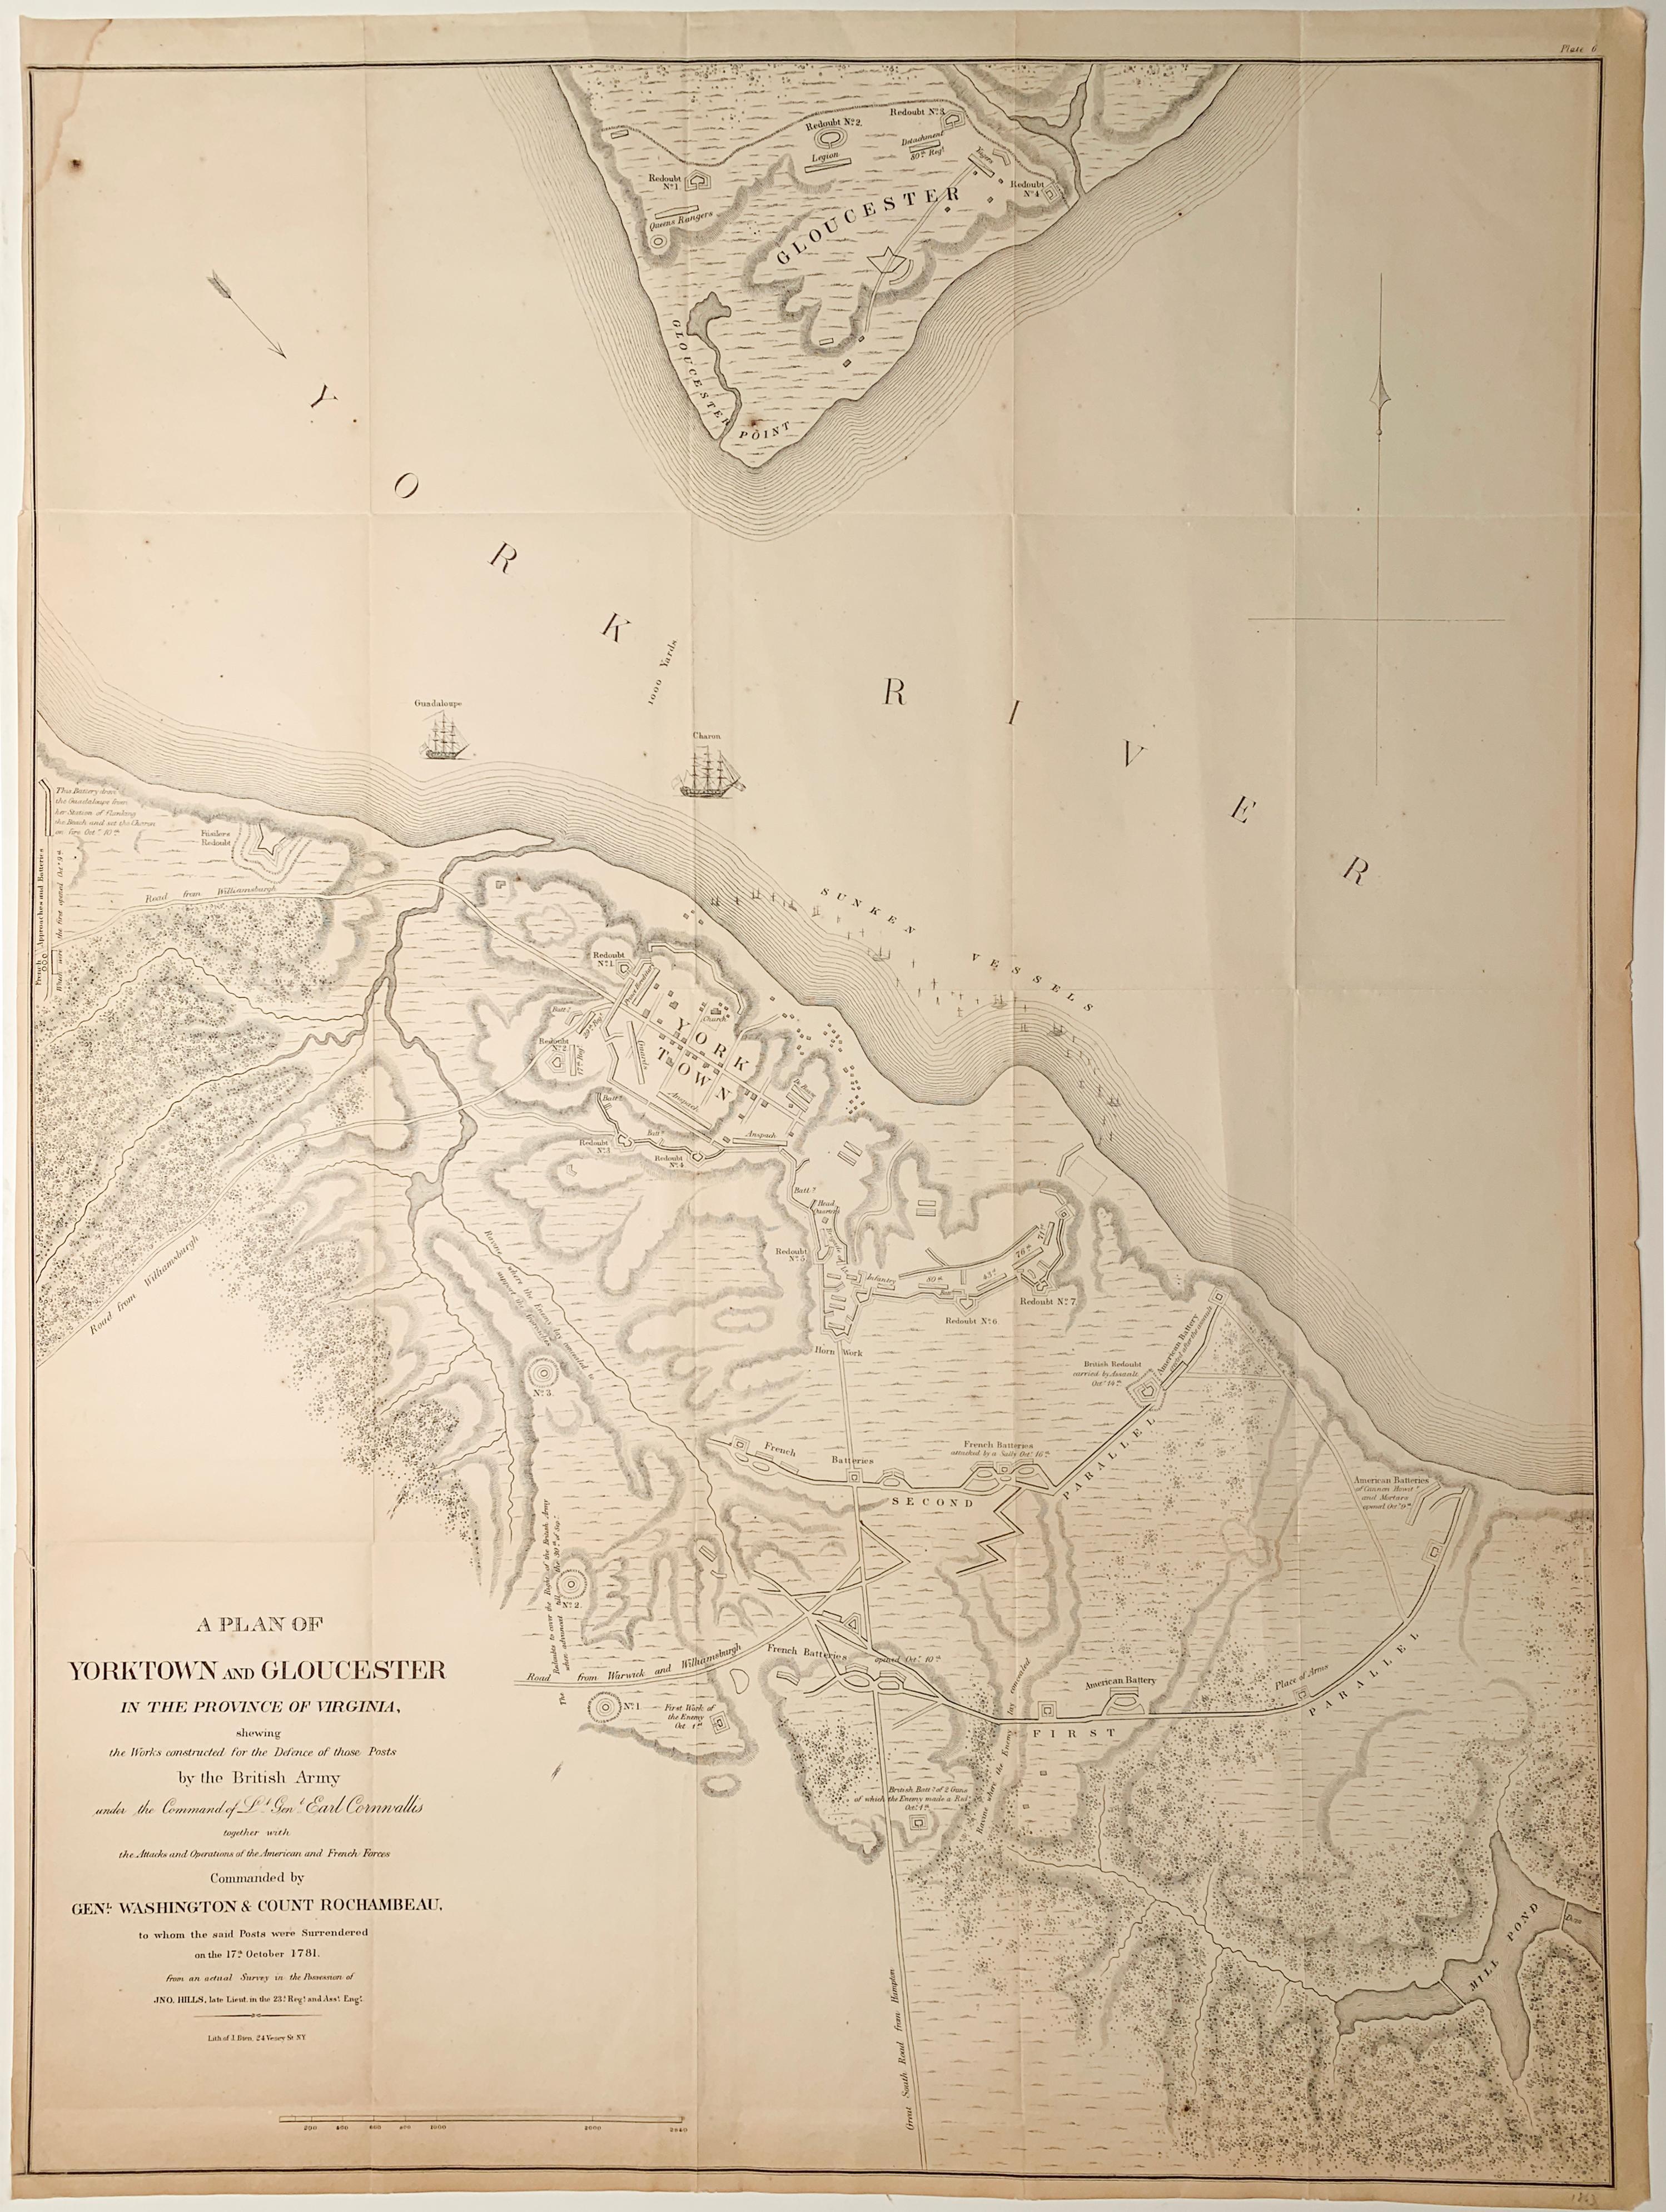 Map of the American Revolution Siege of Yorktown